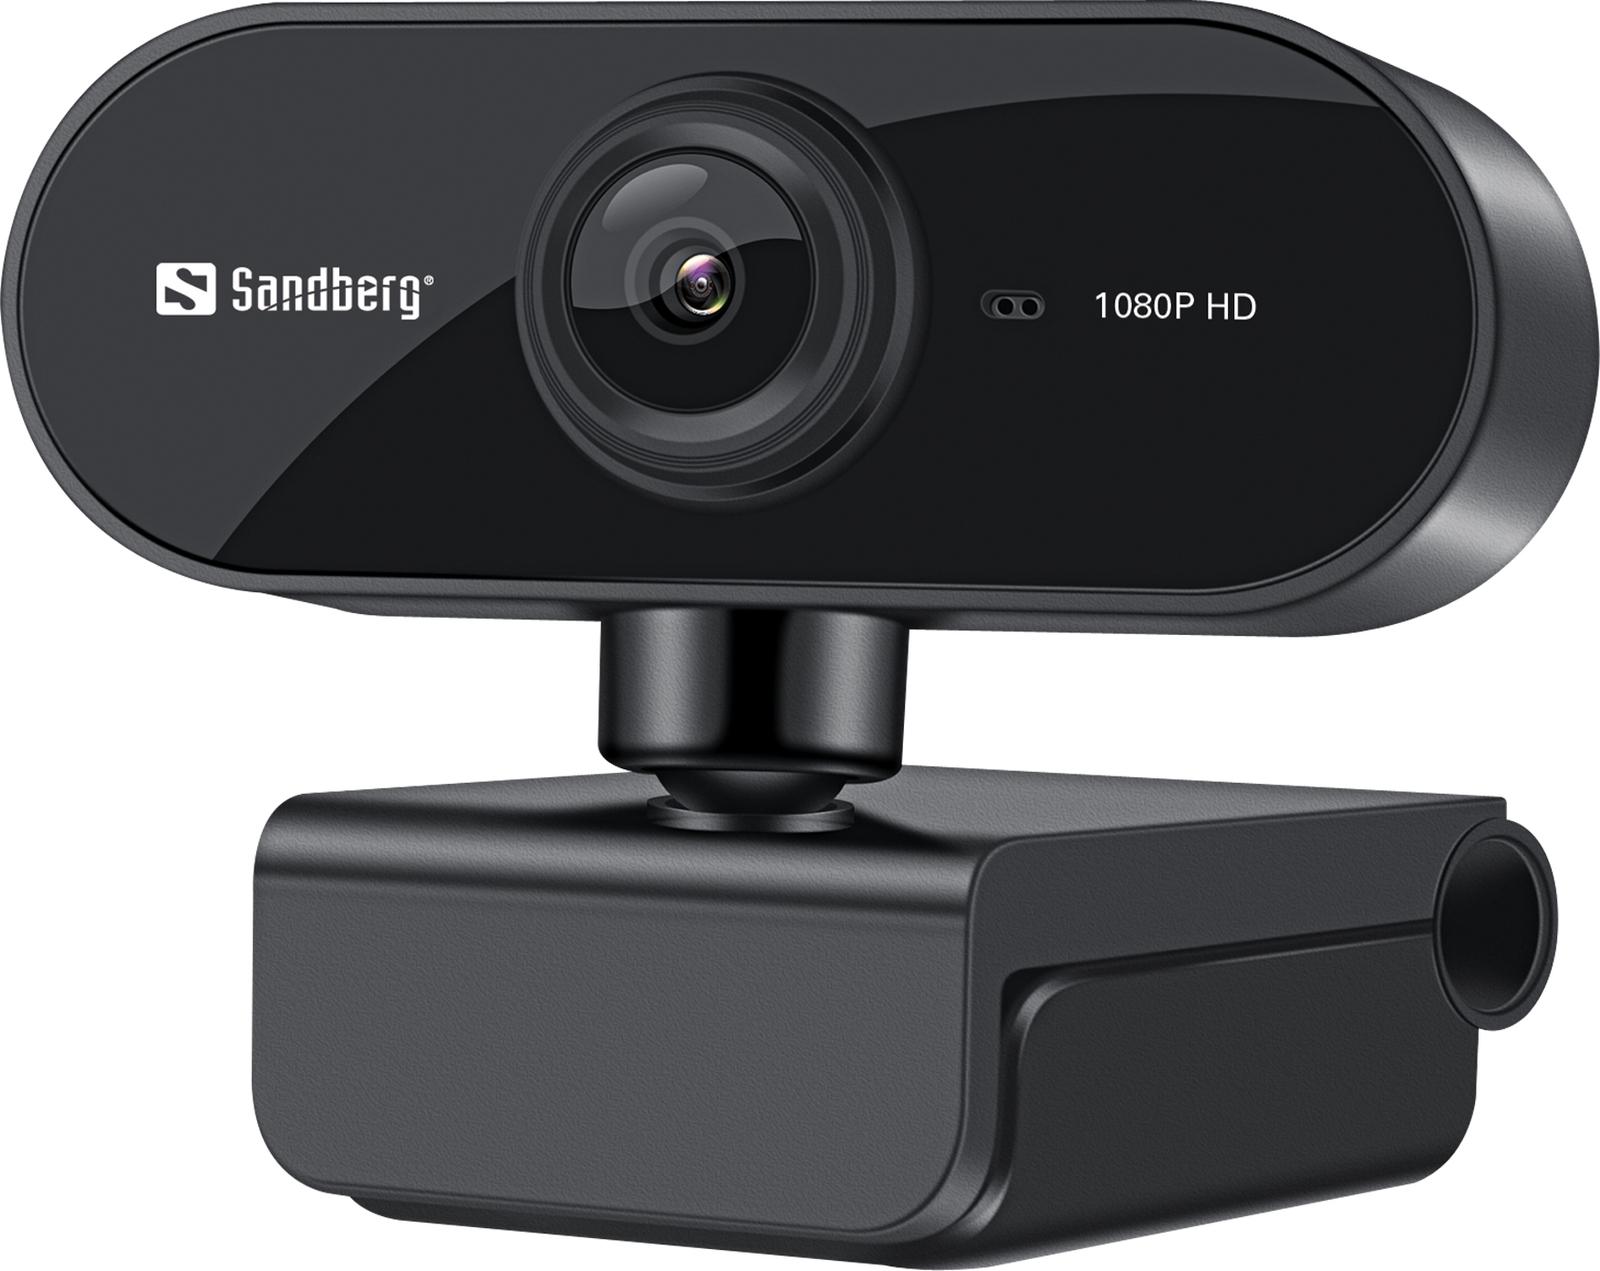 Sandberg USB Webcam Flex 1080P HD  133-97 - eet01